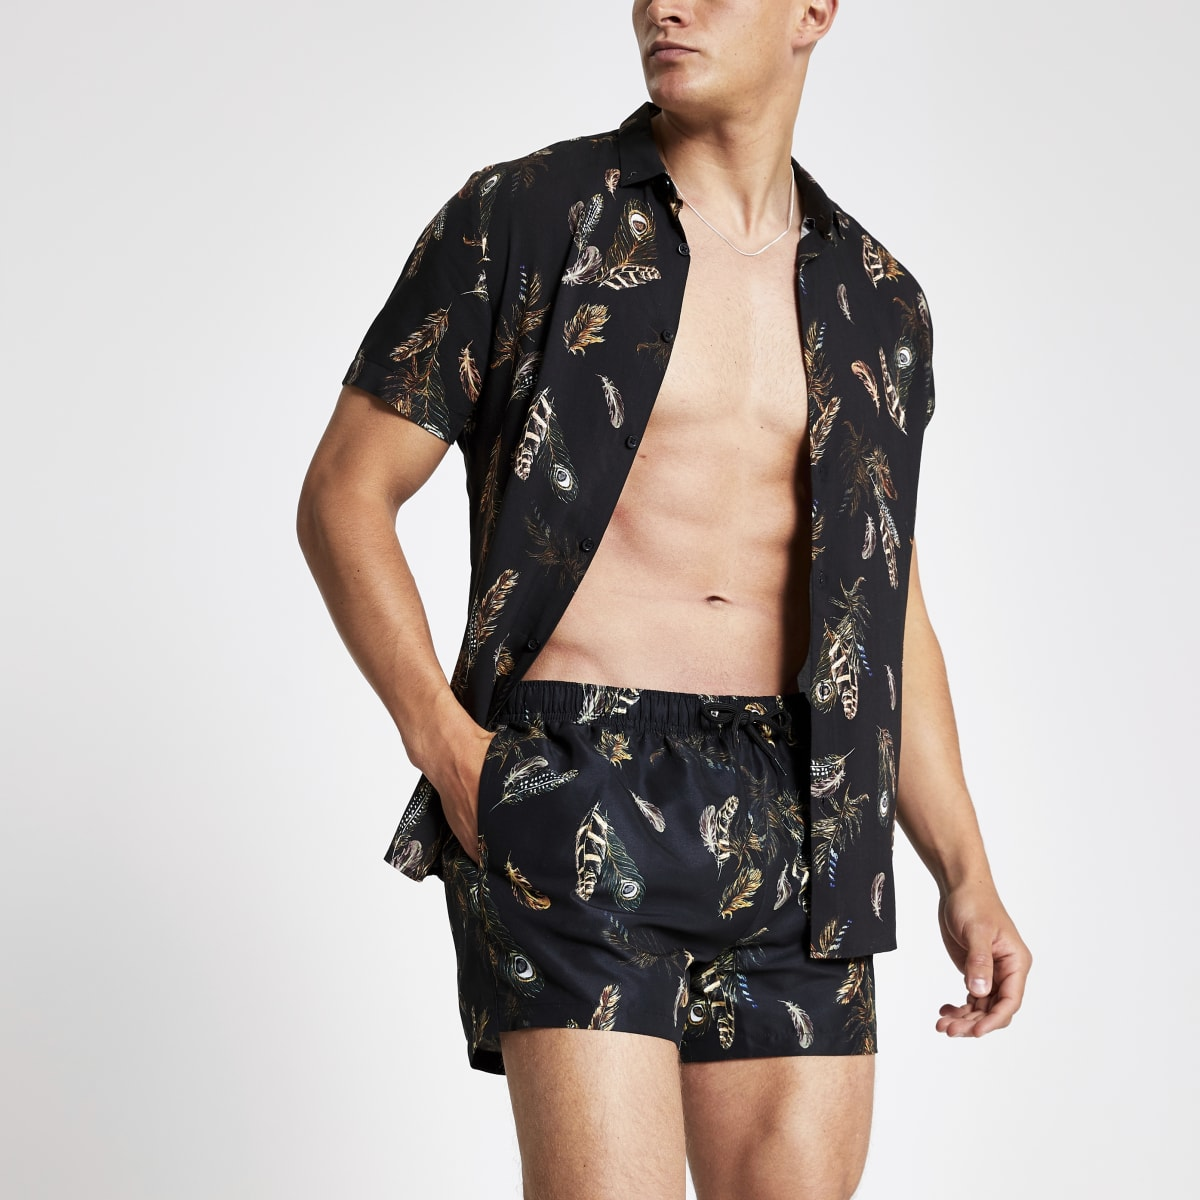 Black feather print swim shorts